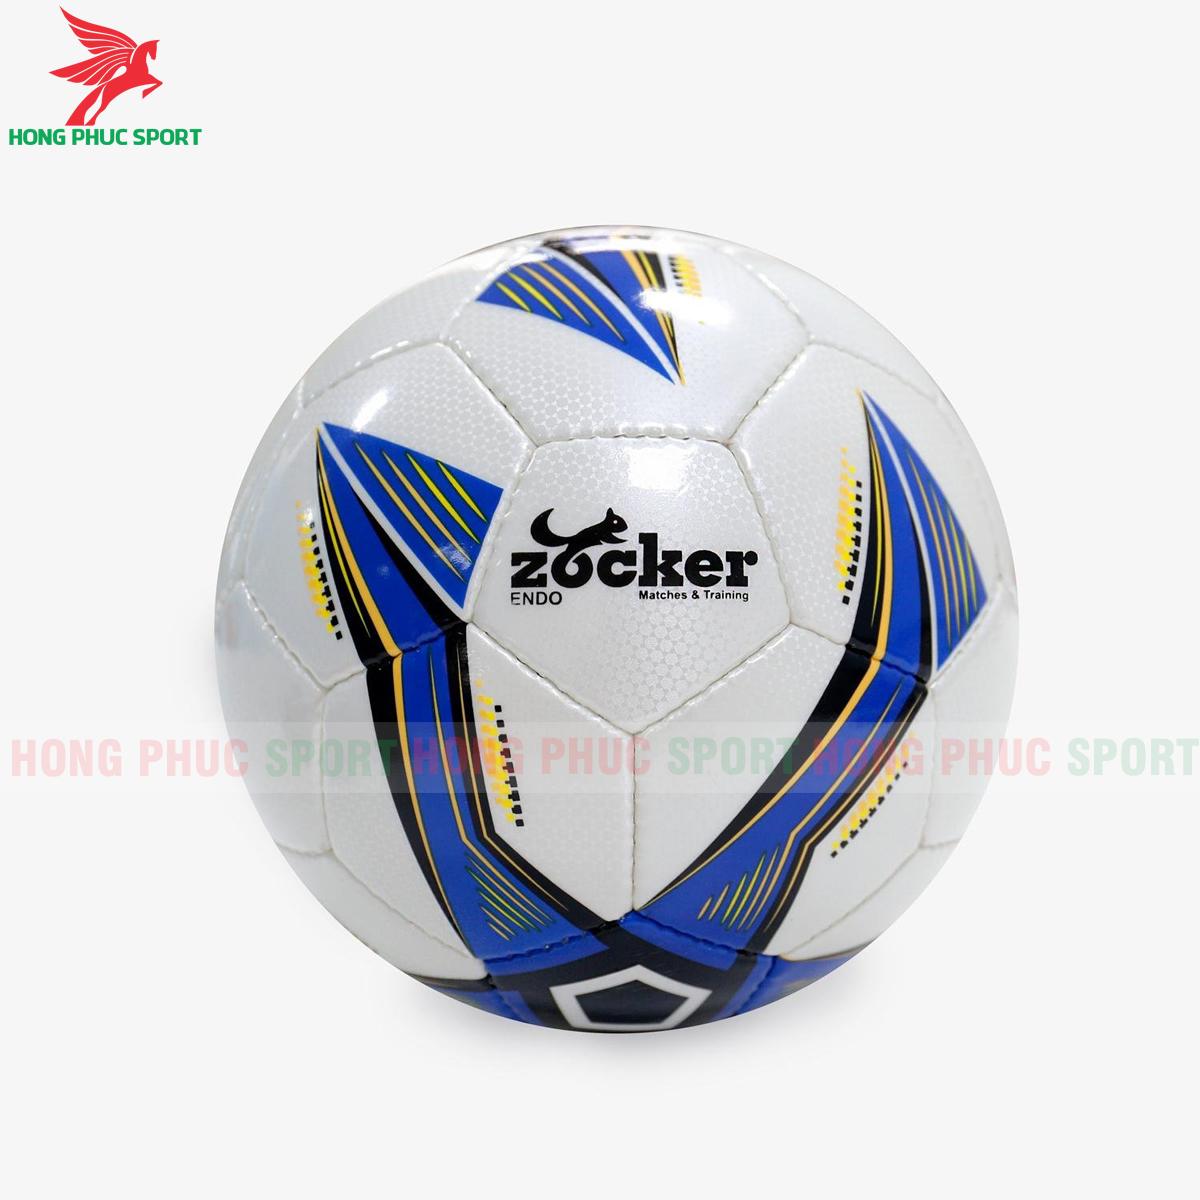 https://cdn.hongphucsport.com/unsafe/s4.shopbay.vn/files/285/qua-bong-da-zocker-endo-e1910-mau-xanh-607518fd1b8ce.png